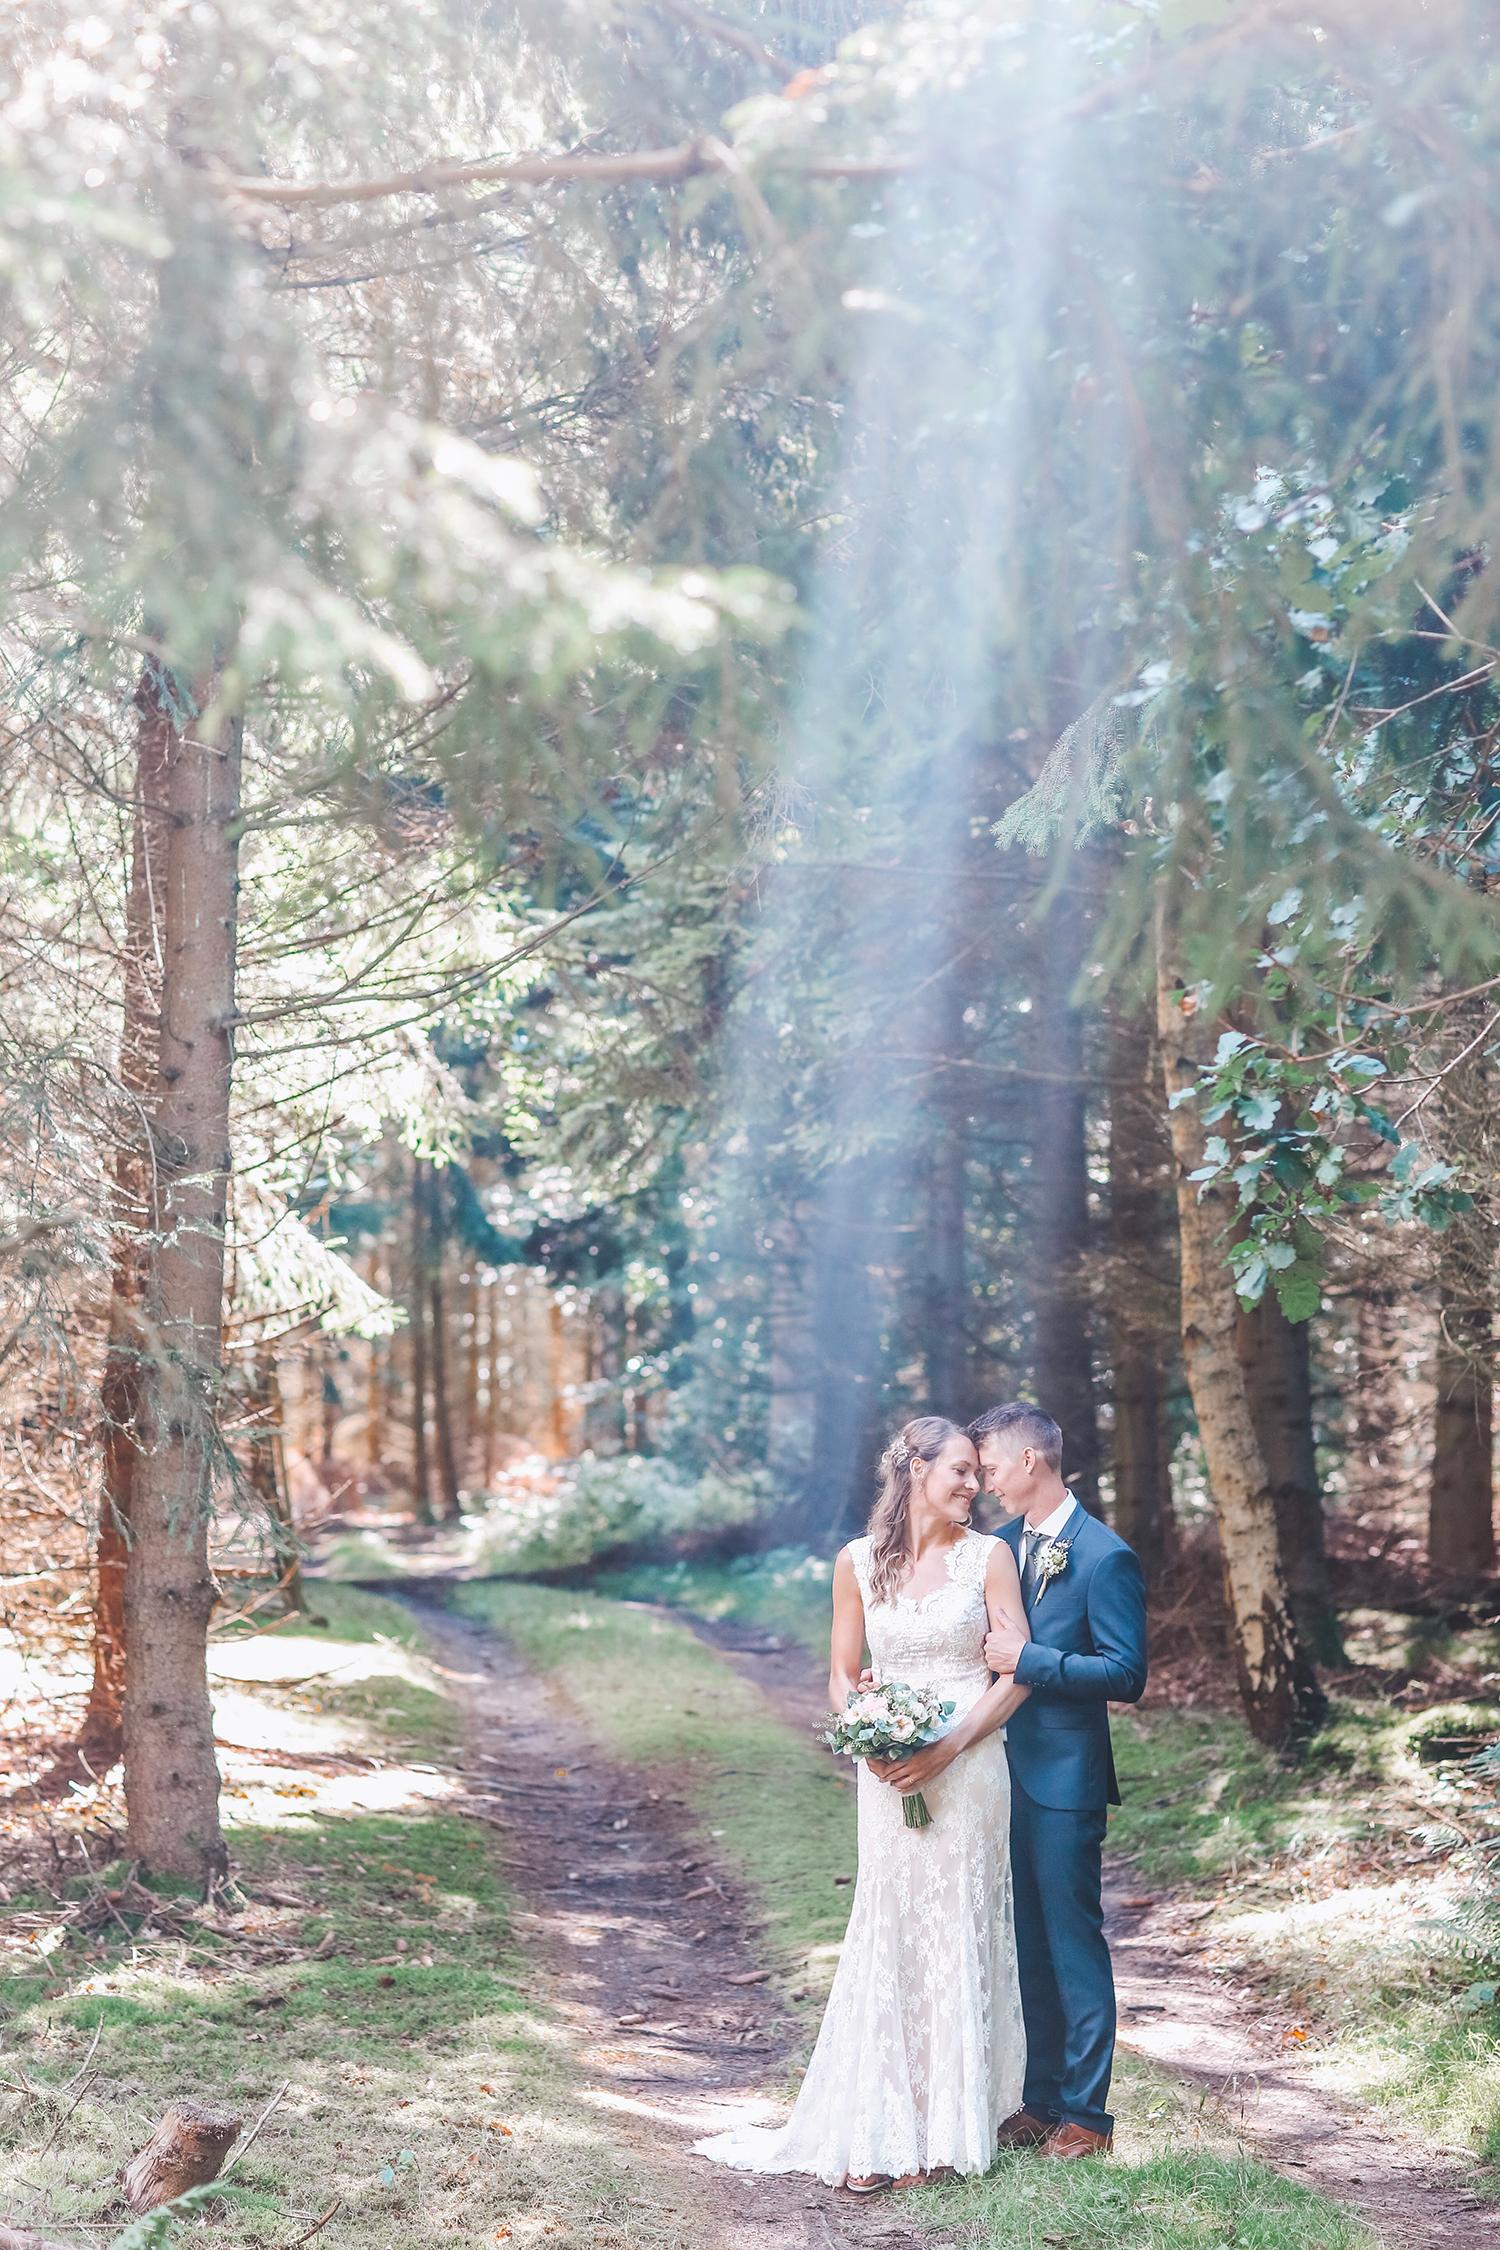 bryllup-i-haven